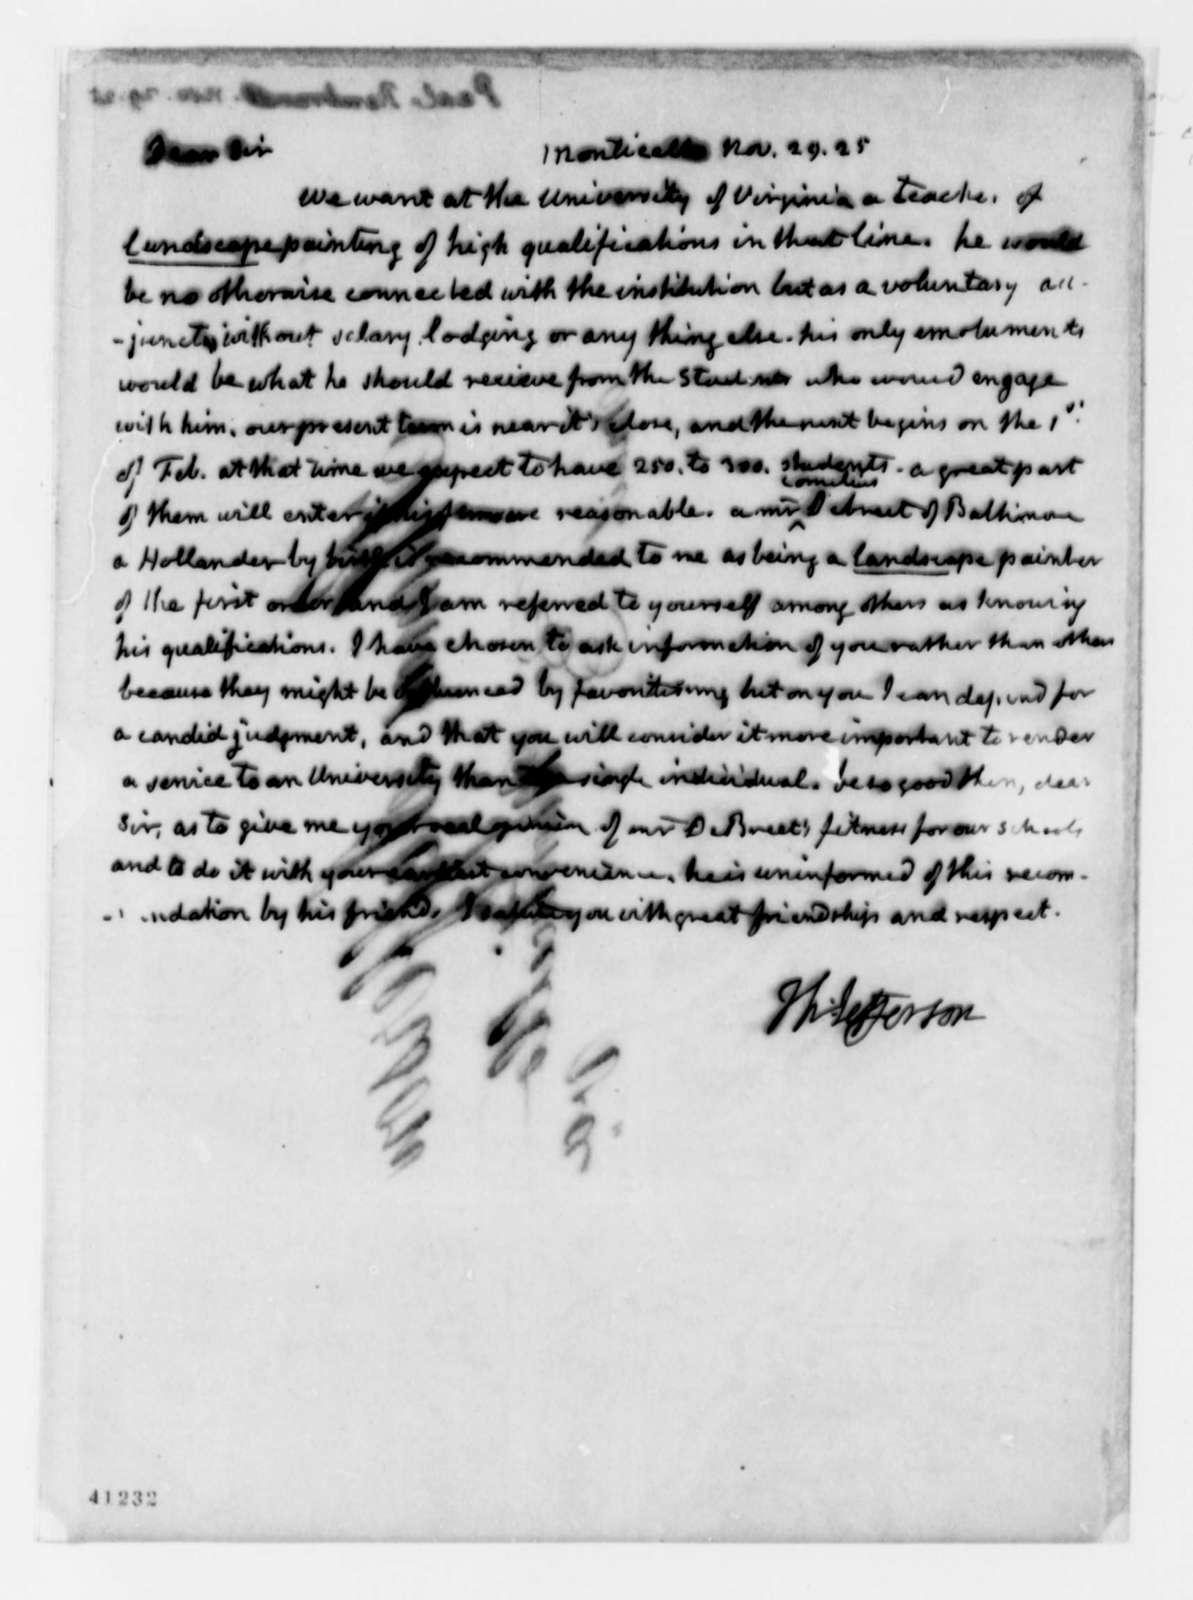 Thomas Jefferson to Rembrandt Peale, November 29, 1825